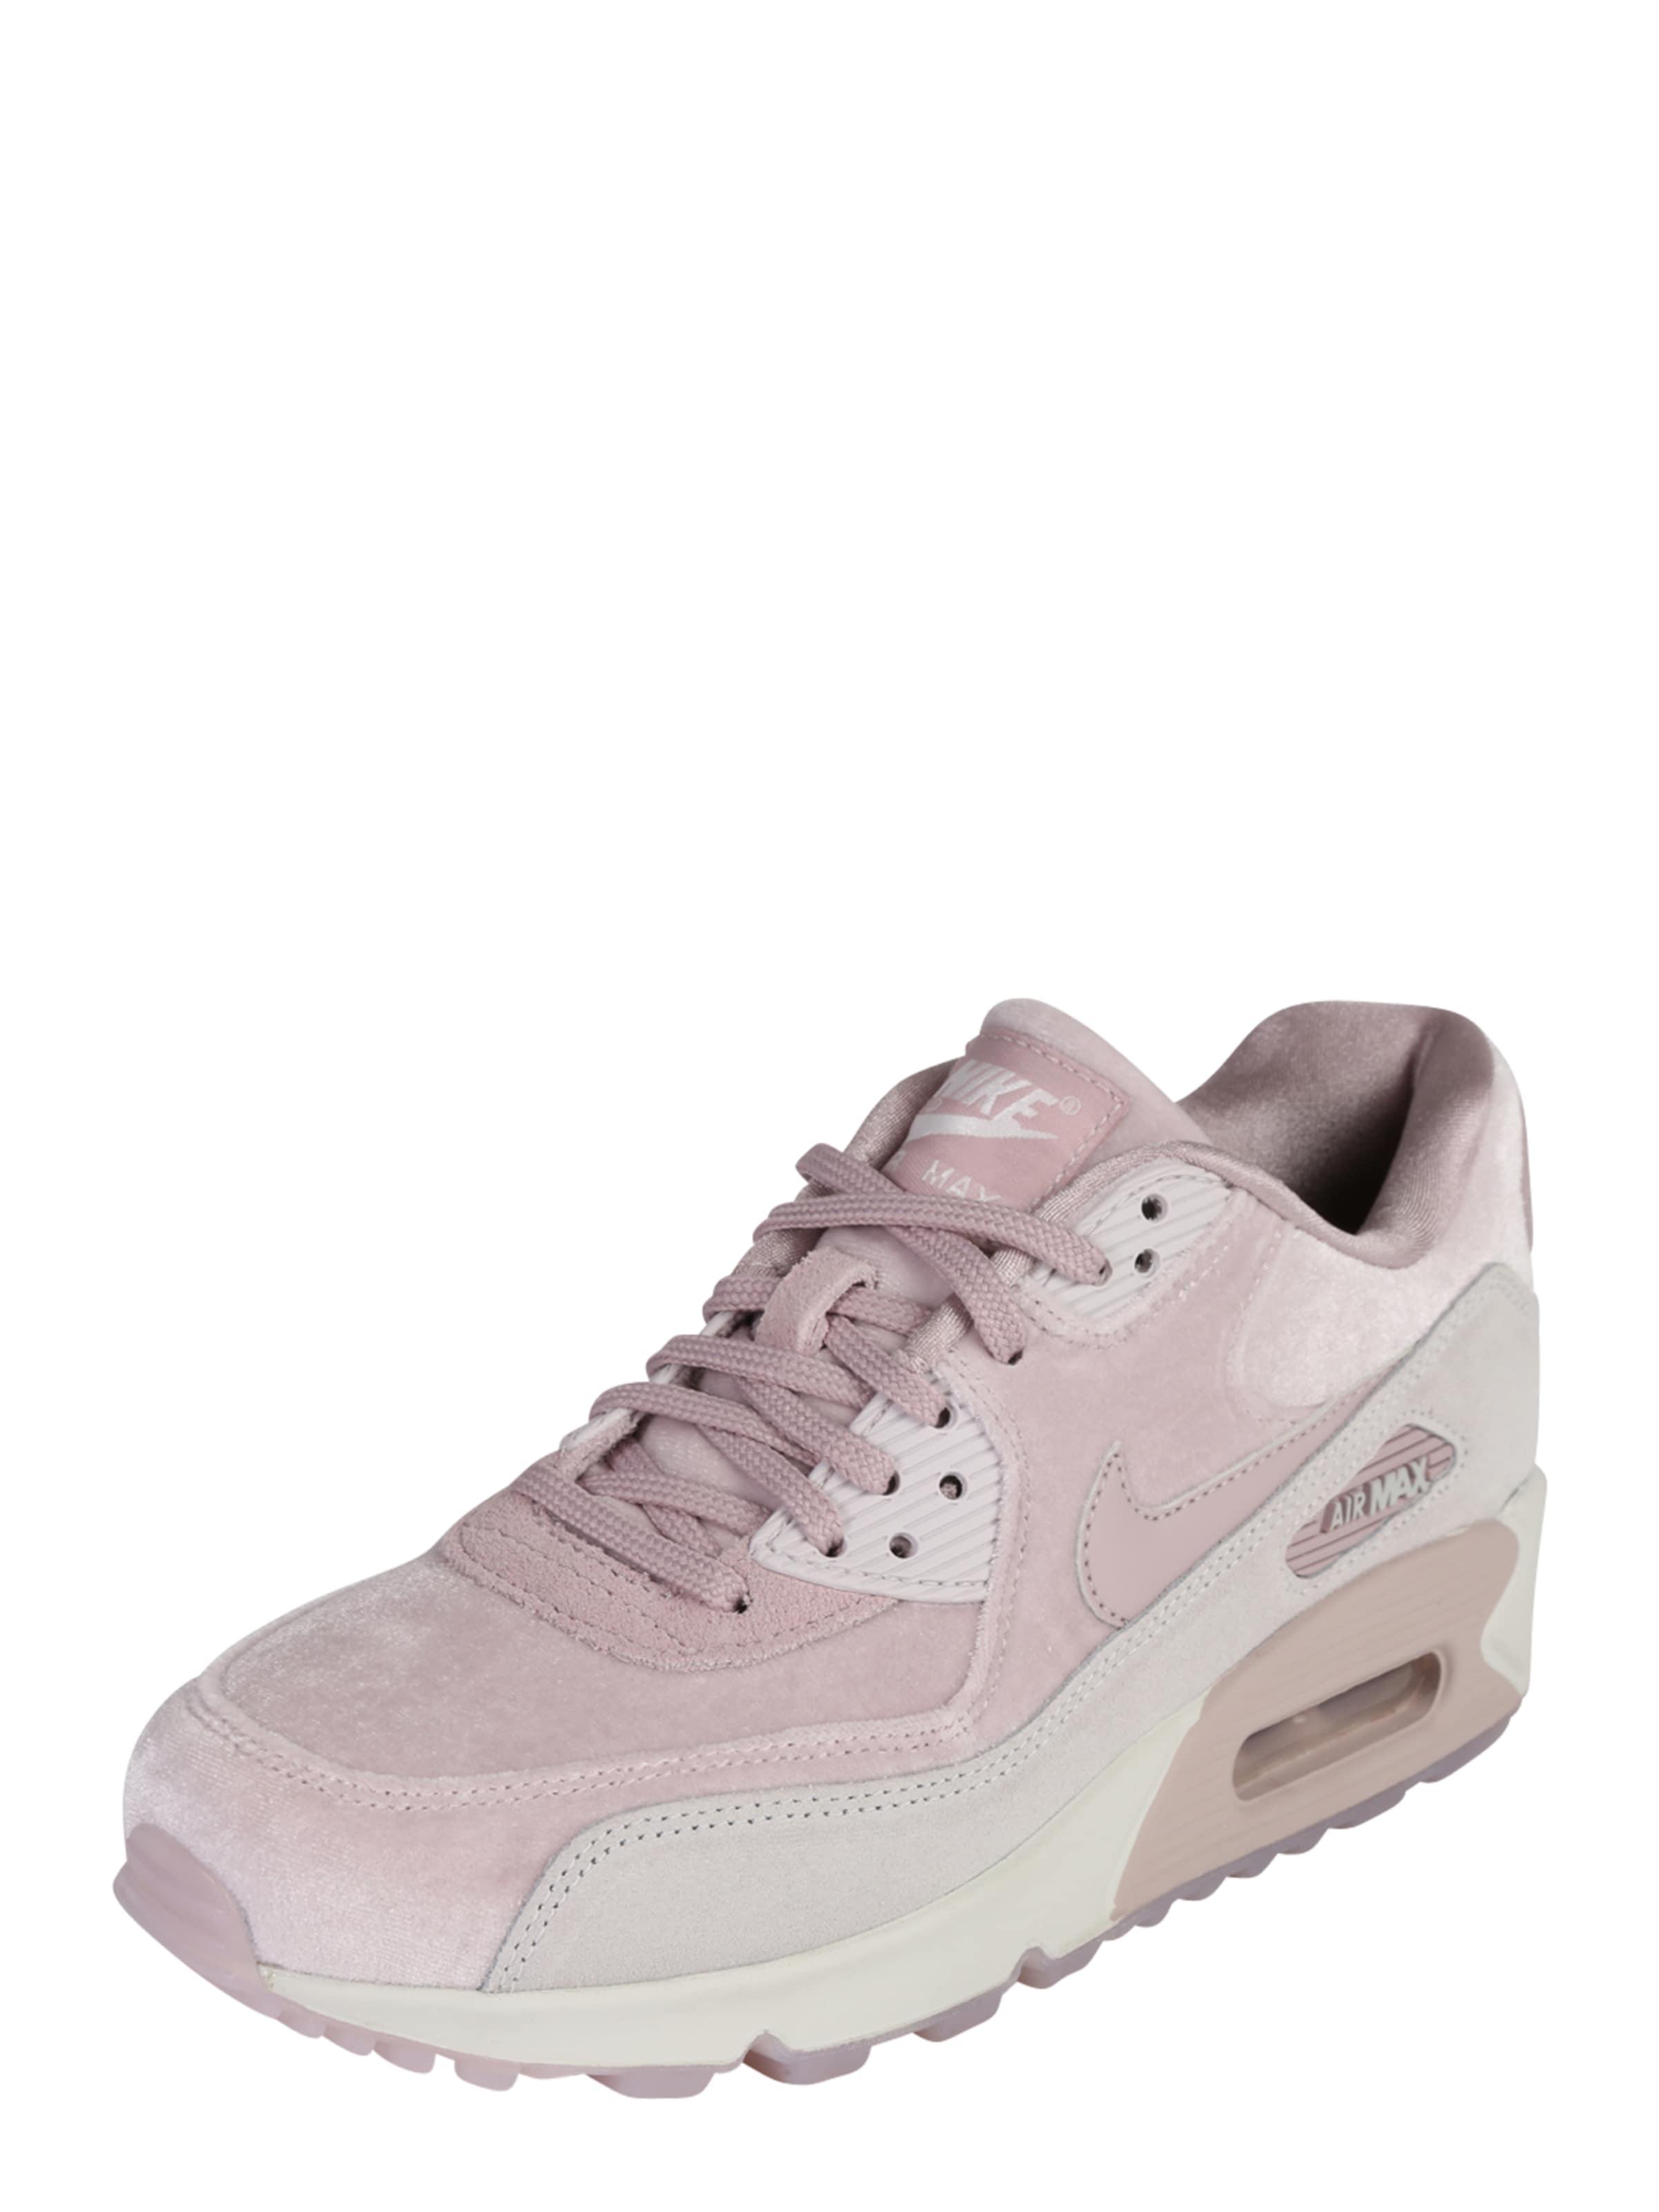 Chaussures De Sport Nike Bas « Air Max Gris / Rosa » 90 Lx W0ykdup